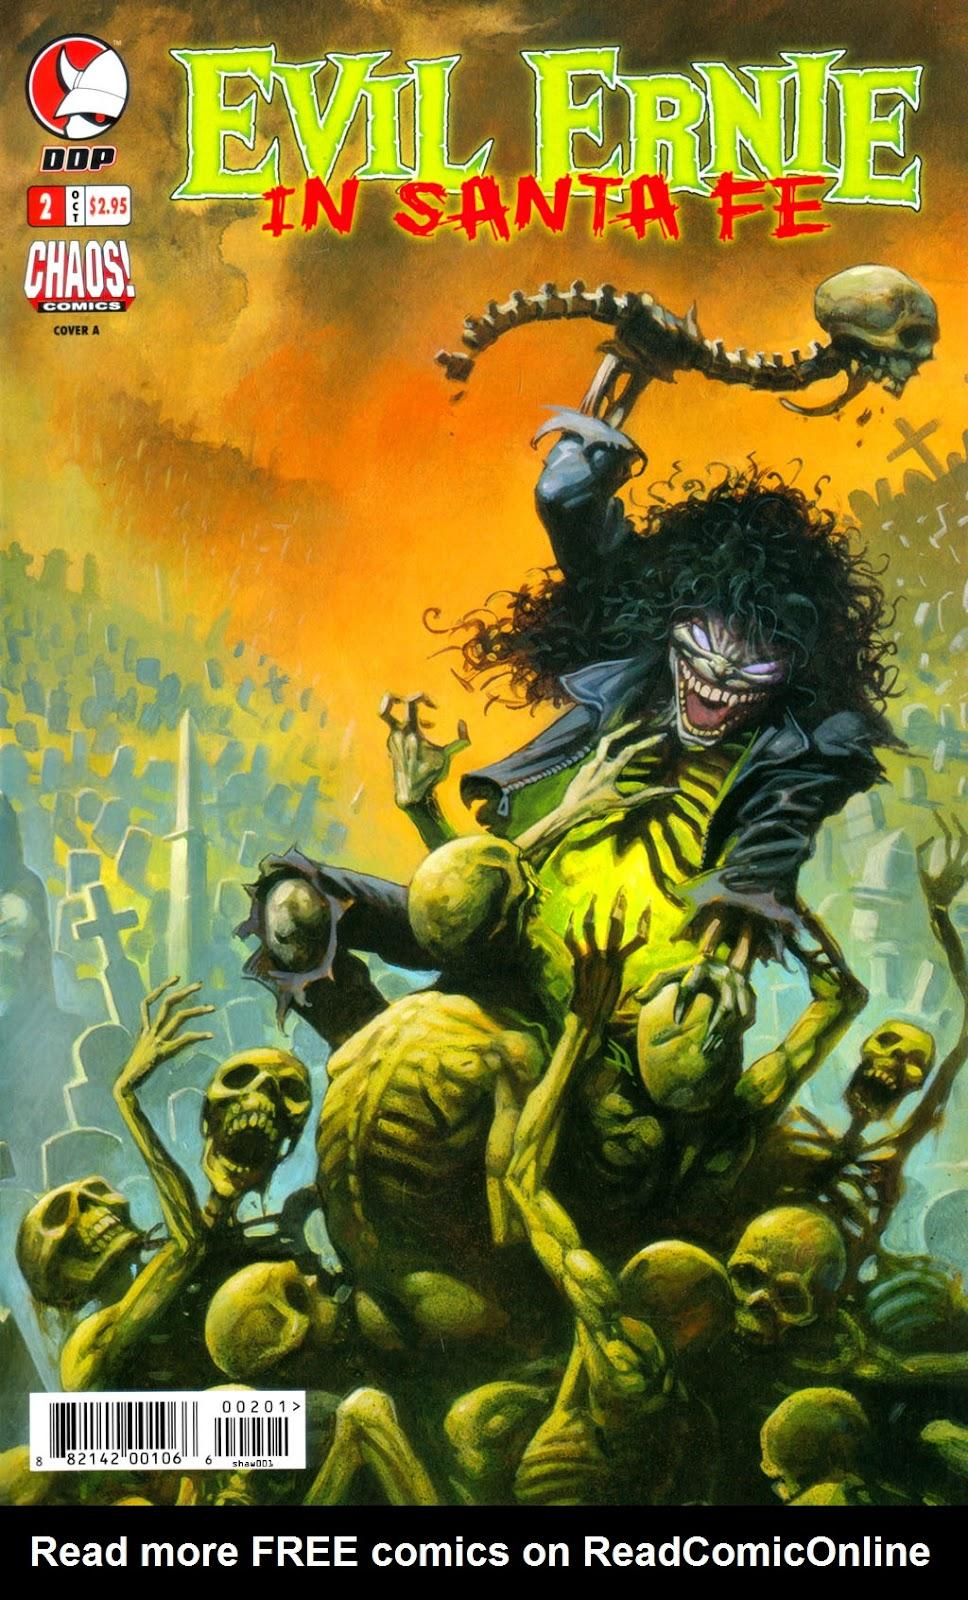 Read online Evil Ernie in Santa Fe comic -  Issue #2 - 1